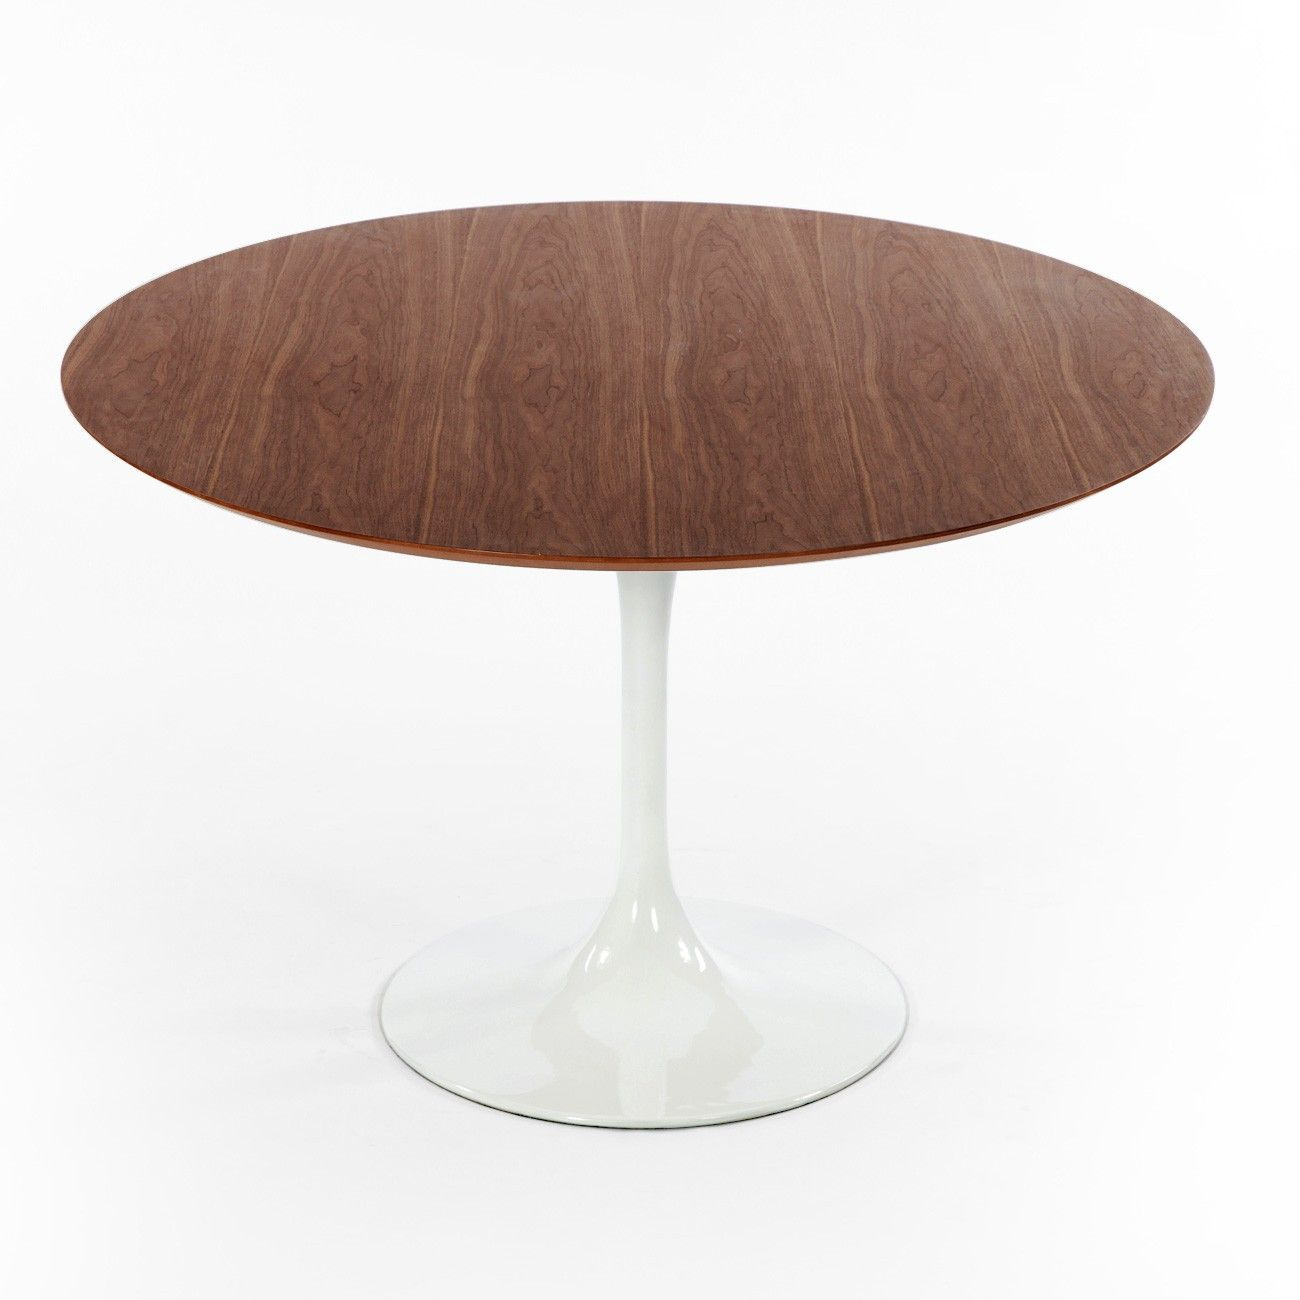 Modern classics delivered in 1 3 weeks lacuna modern furniture custom import classic art rug lighting interior design hospitality